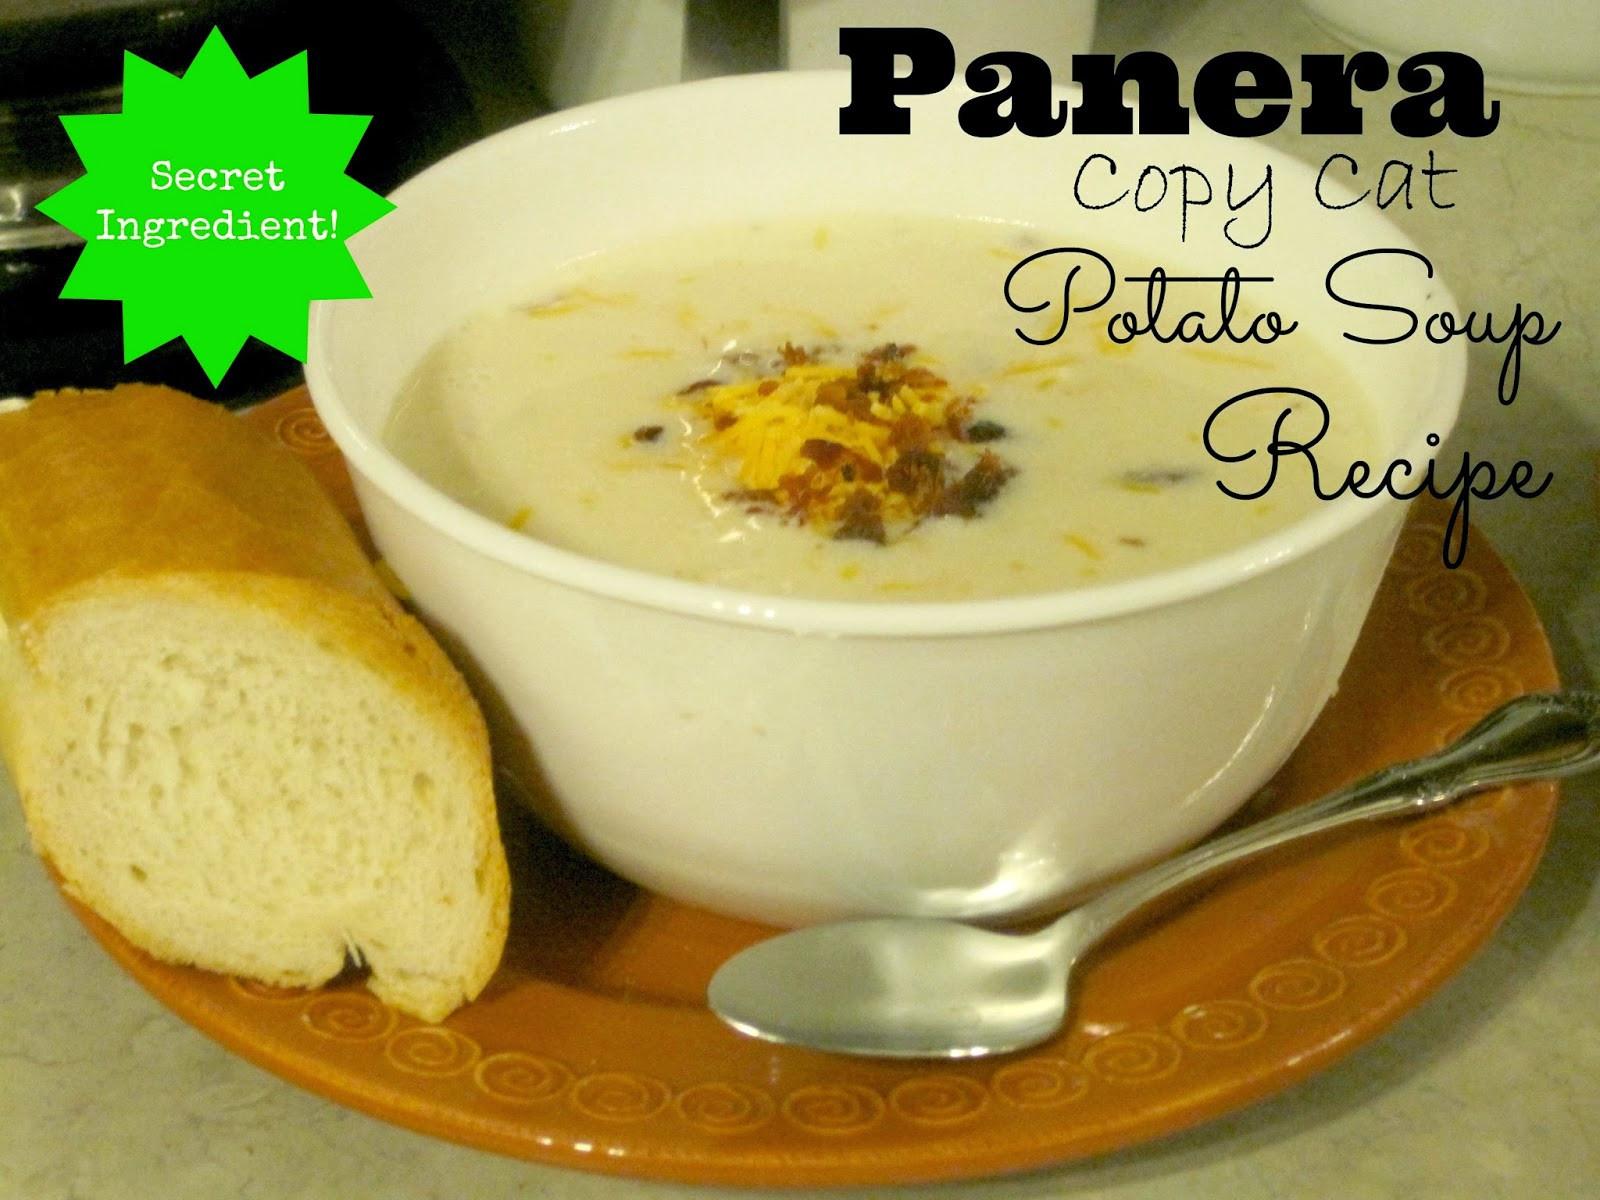 Baked Potato Soup Panera  Decorated Chaos Potato Soup Recipe Panera Copy Cat